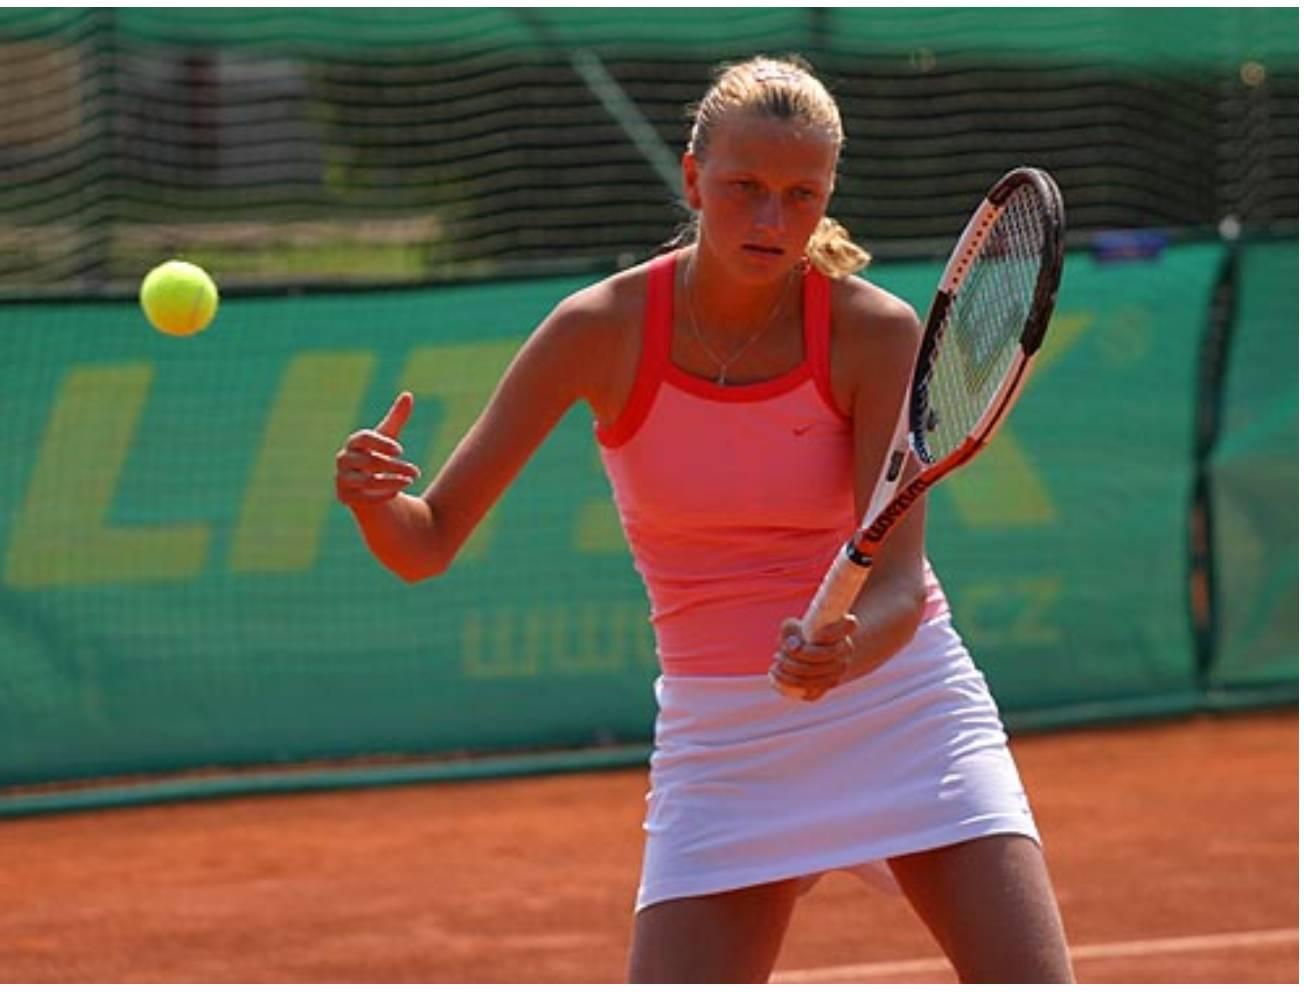 Petra Kvitova young 2